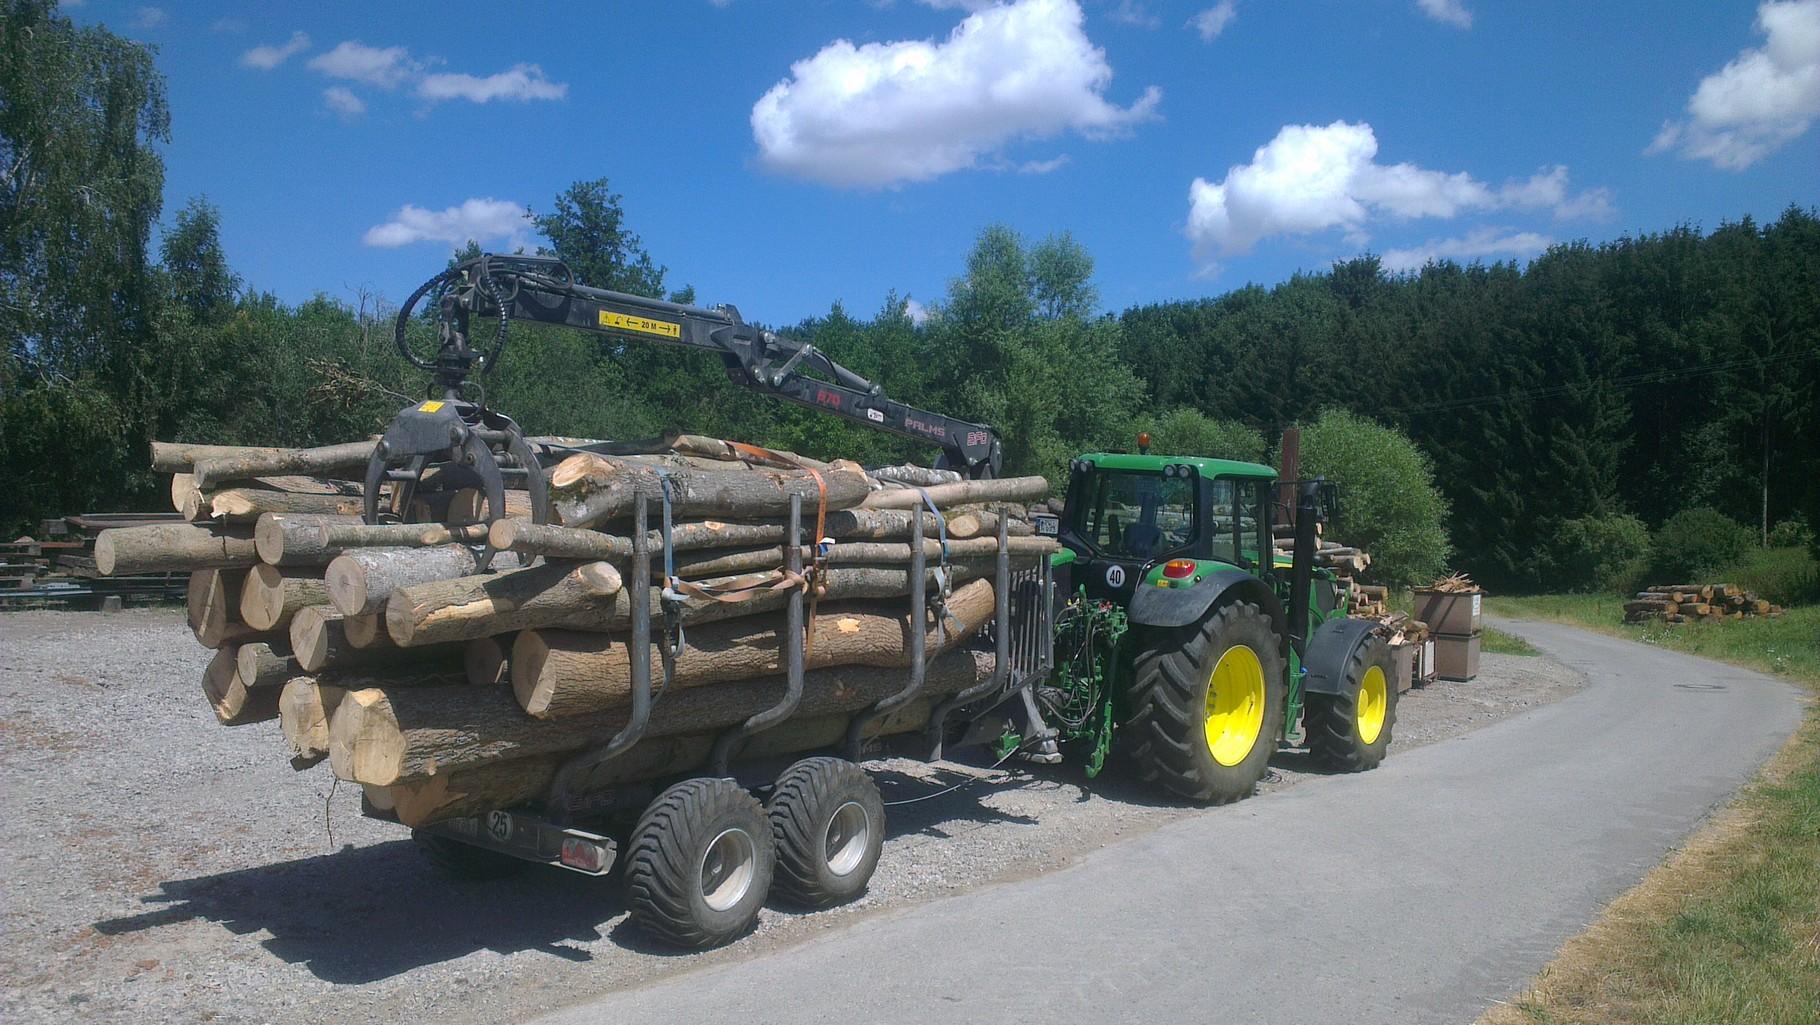 Brennholz am Holzplatz abladen